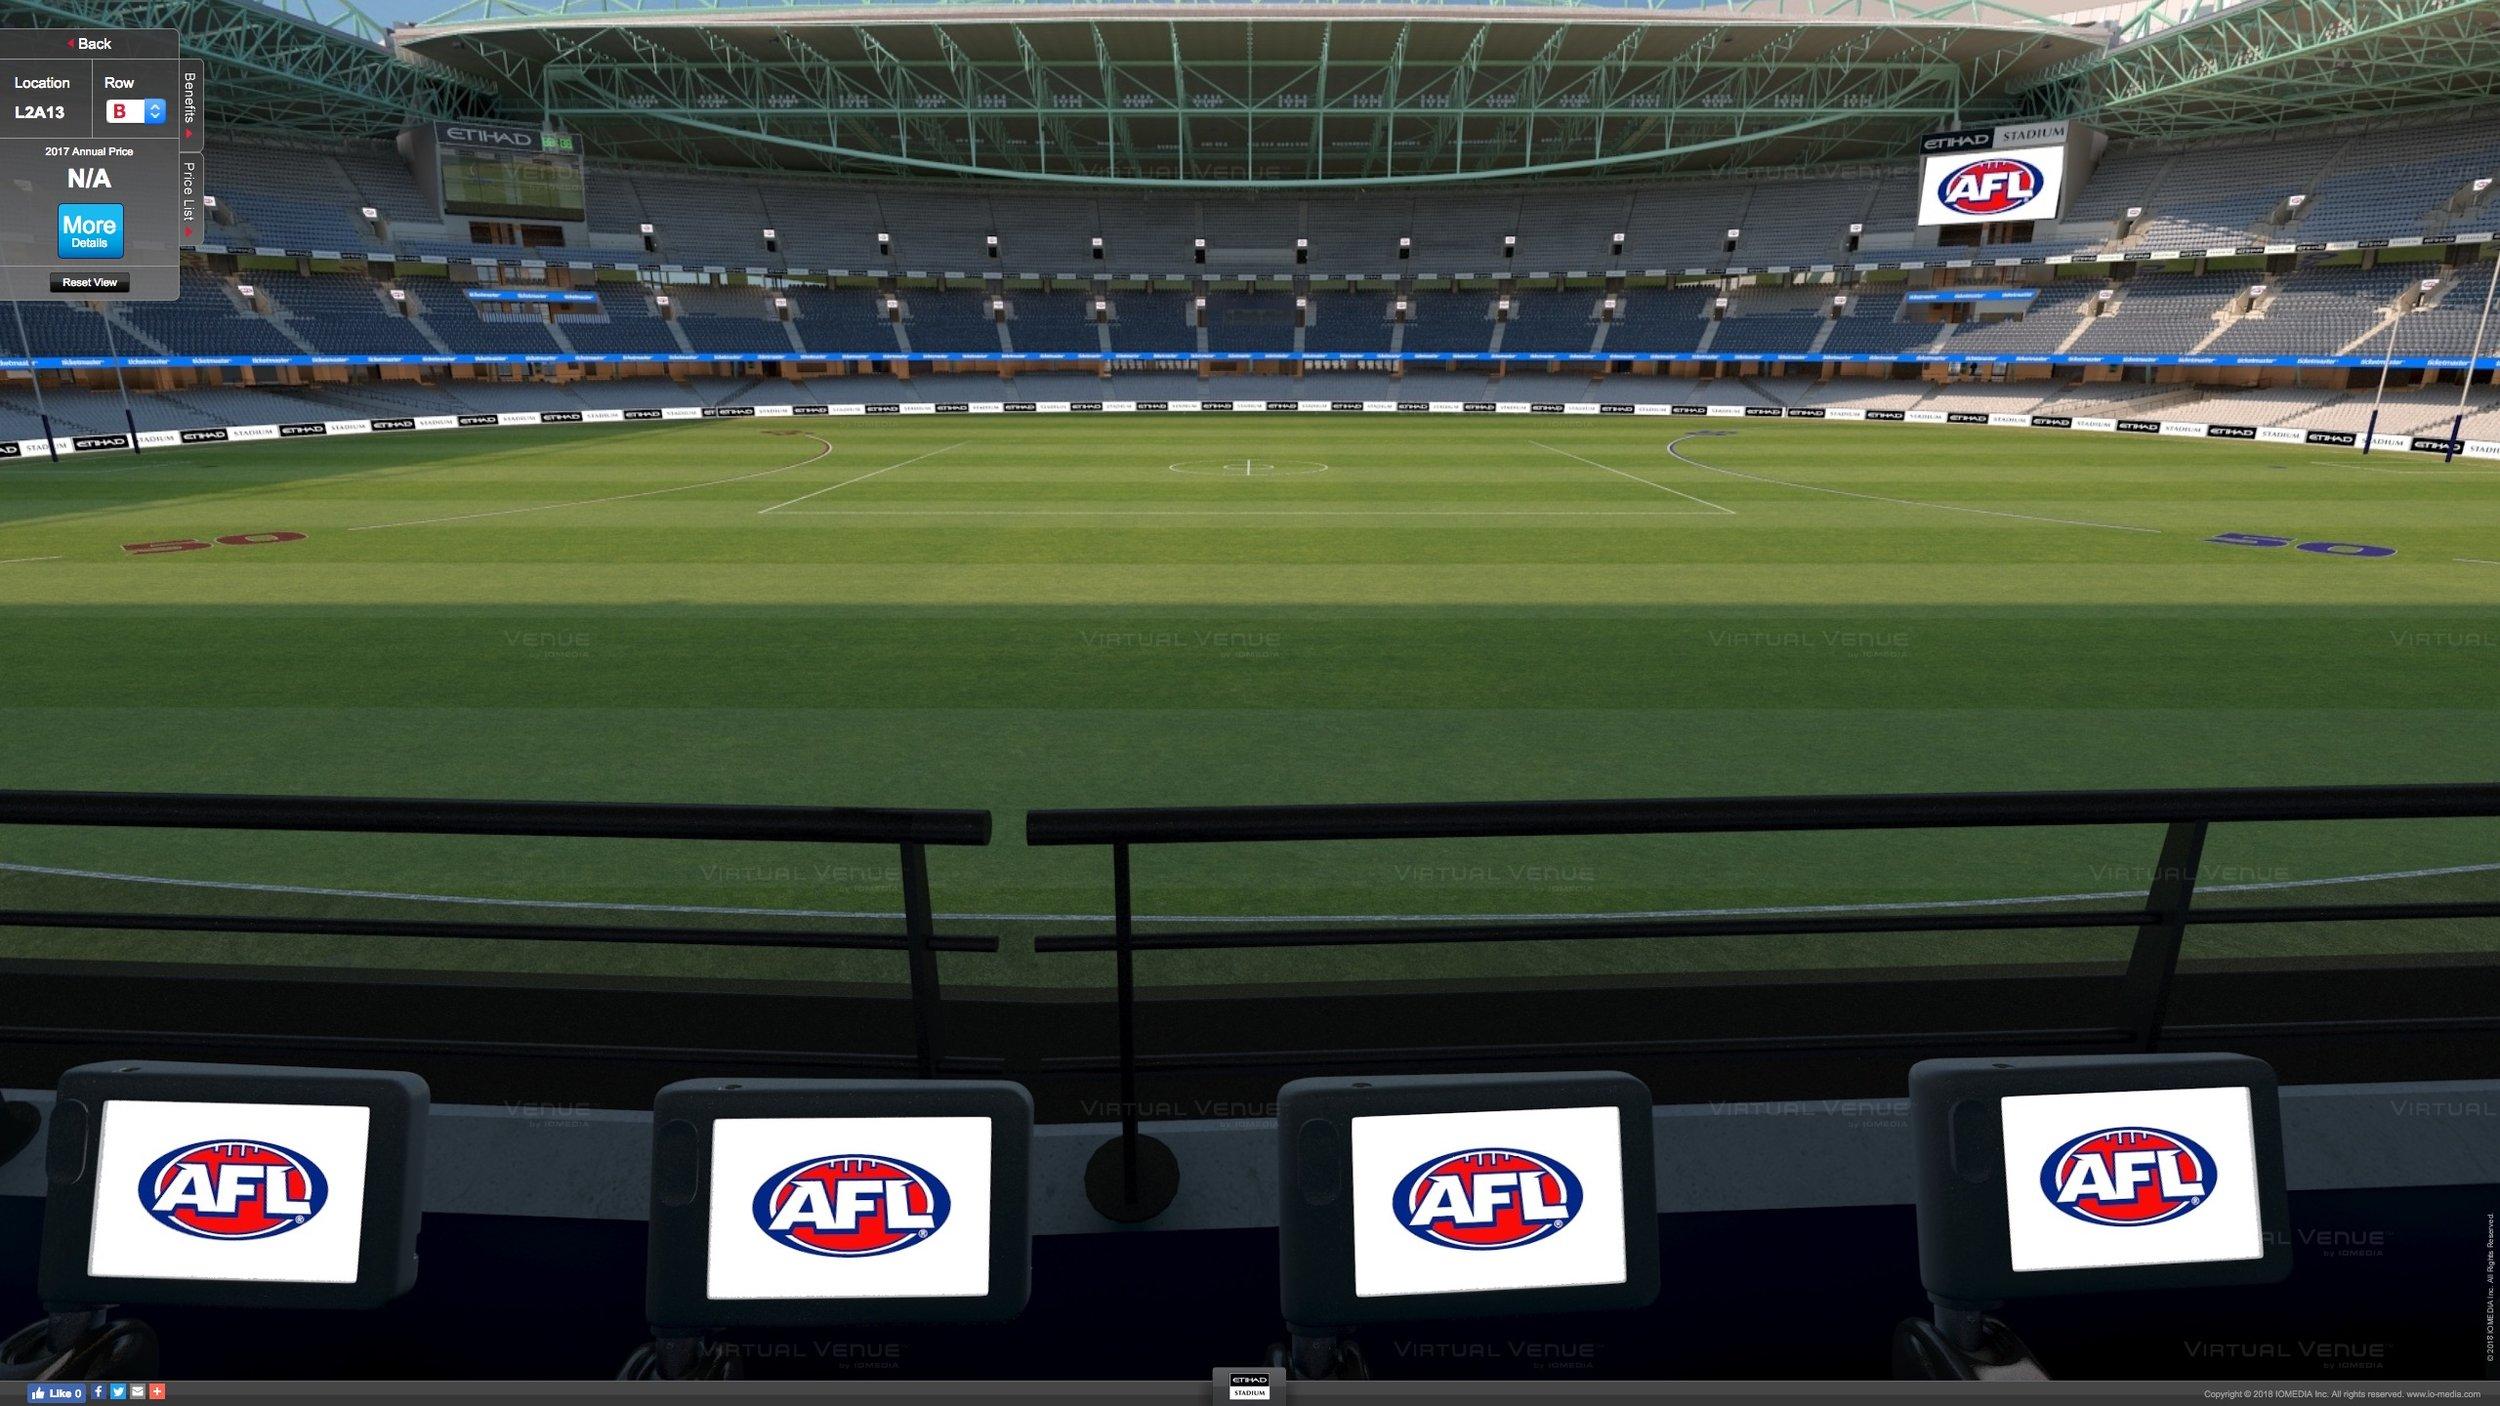 Western Bulldogs v Melbourne Marvel Stadium Level 2 AFL tickets